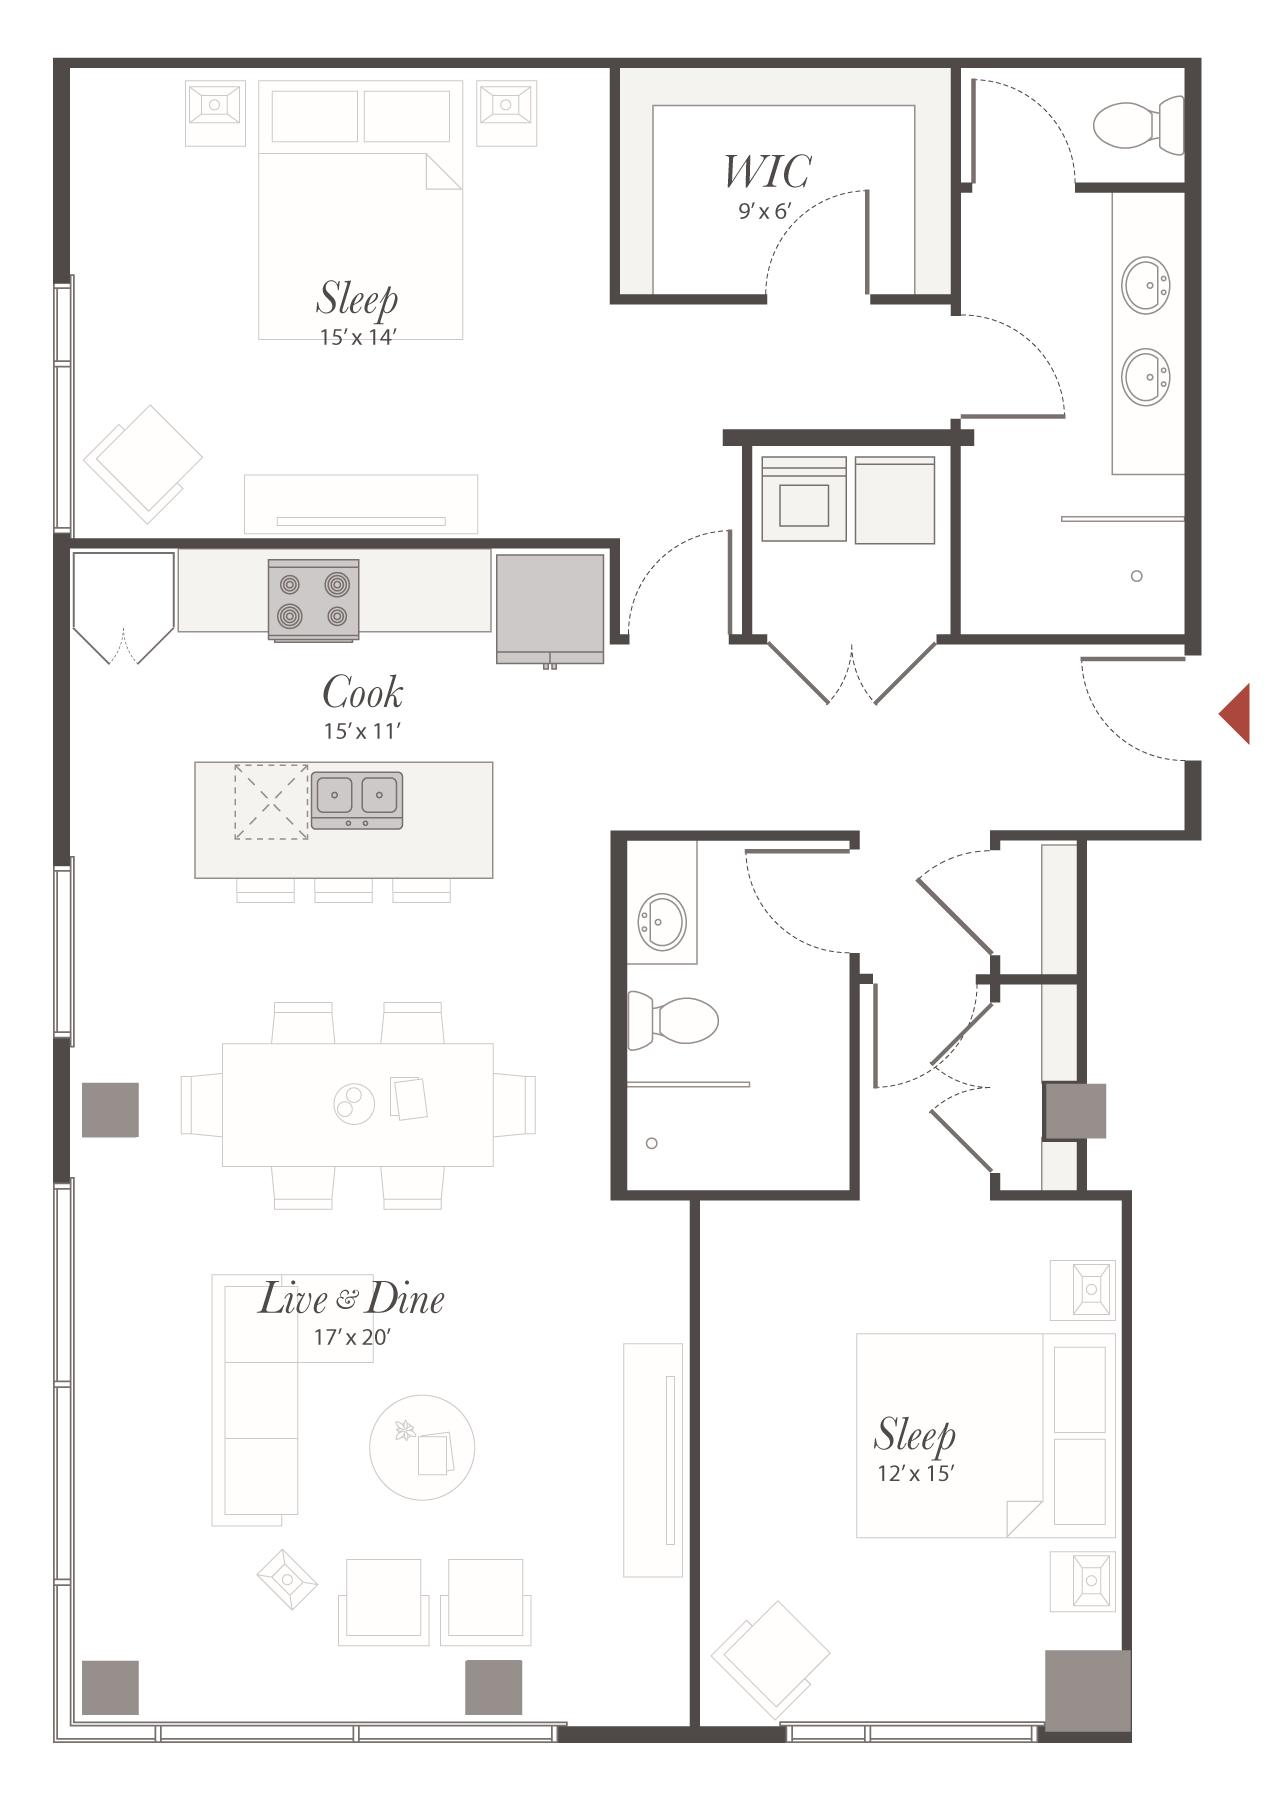 T8 2 bedroom apartment cincinnati encore apartments - 2 bedroom apartments in cincinnati ...